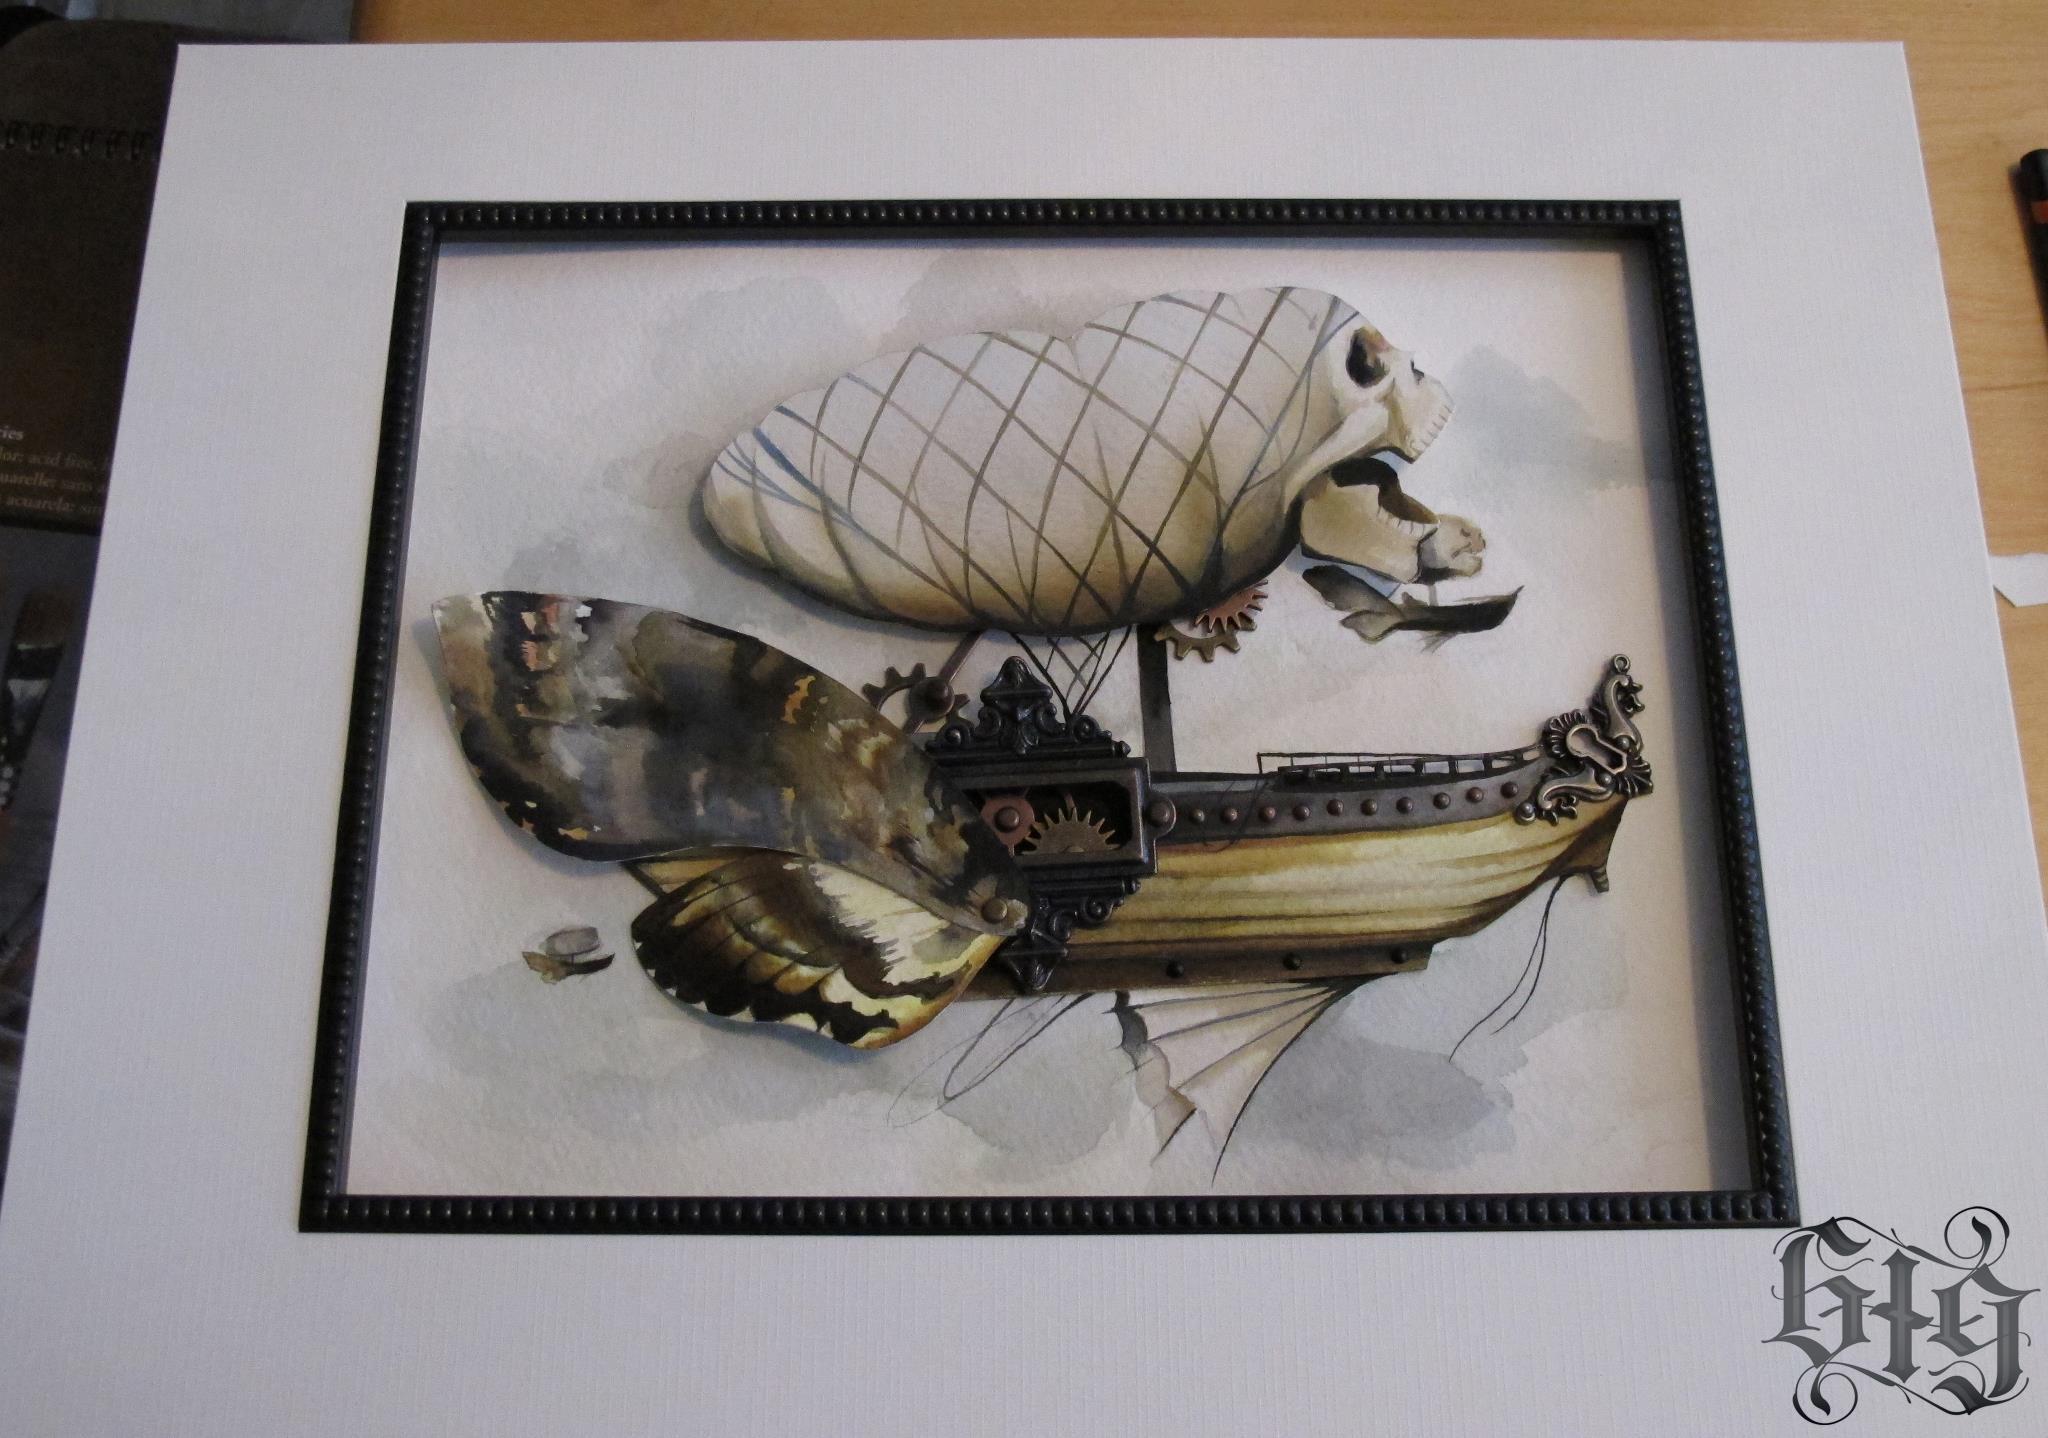 Steampunk Moth Armada in fine detail and watercolor.Original Artwork